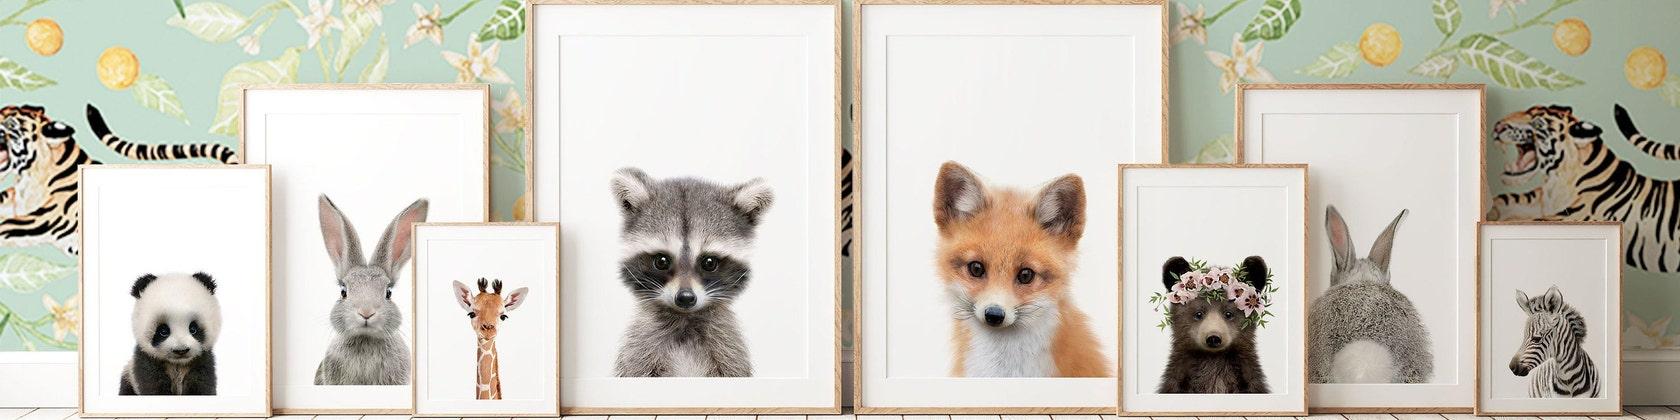 Childrens Fox Demi Visage Masque Animal Garçons Filles Semaine Du Livre Jour robe fantaisie